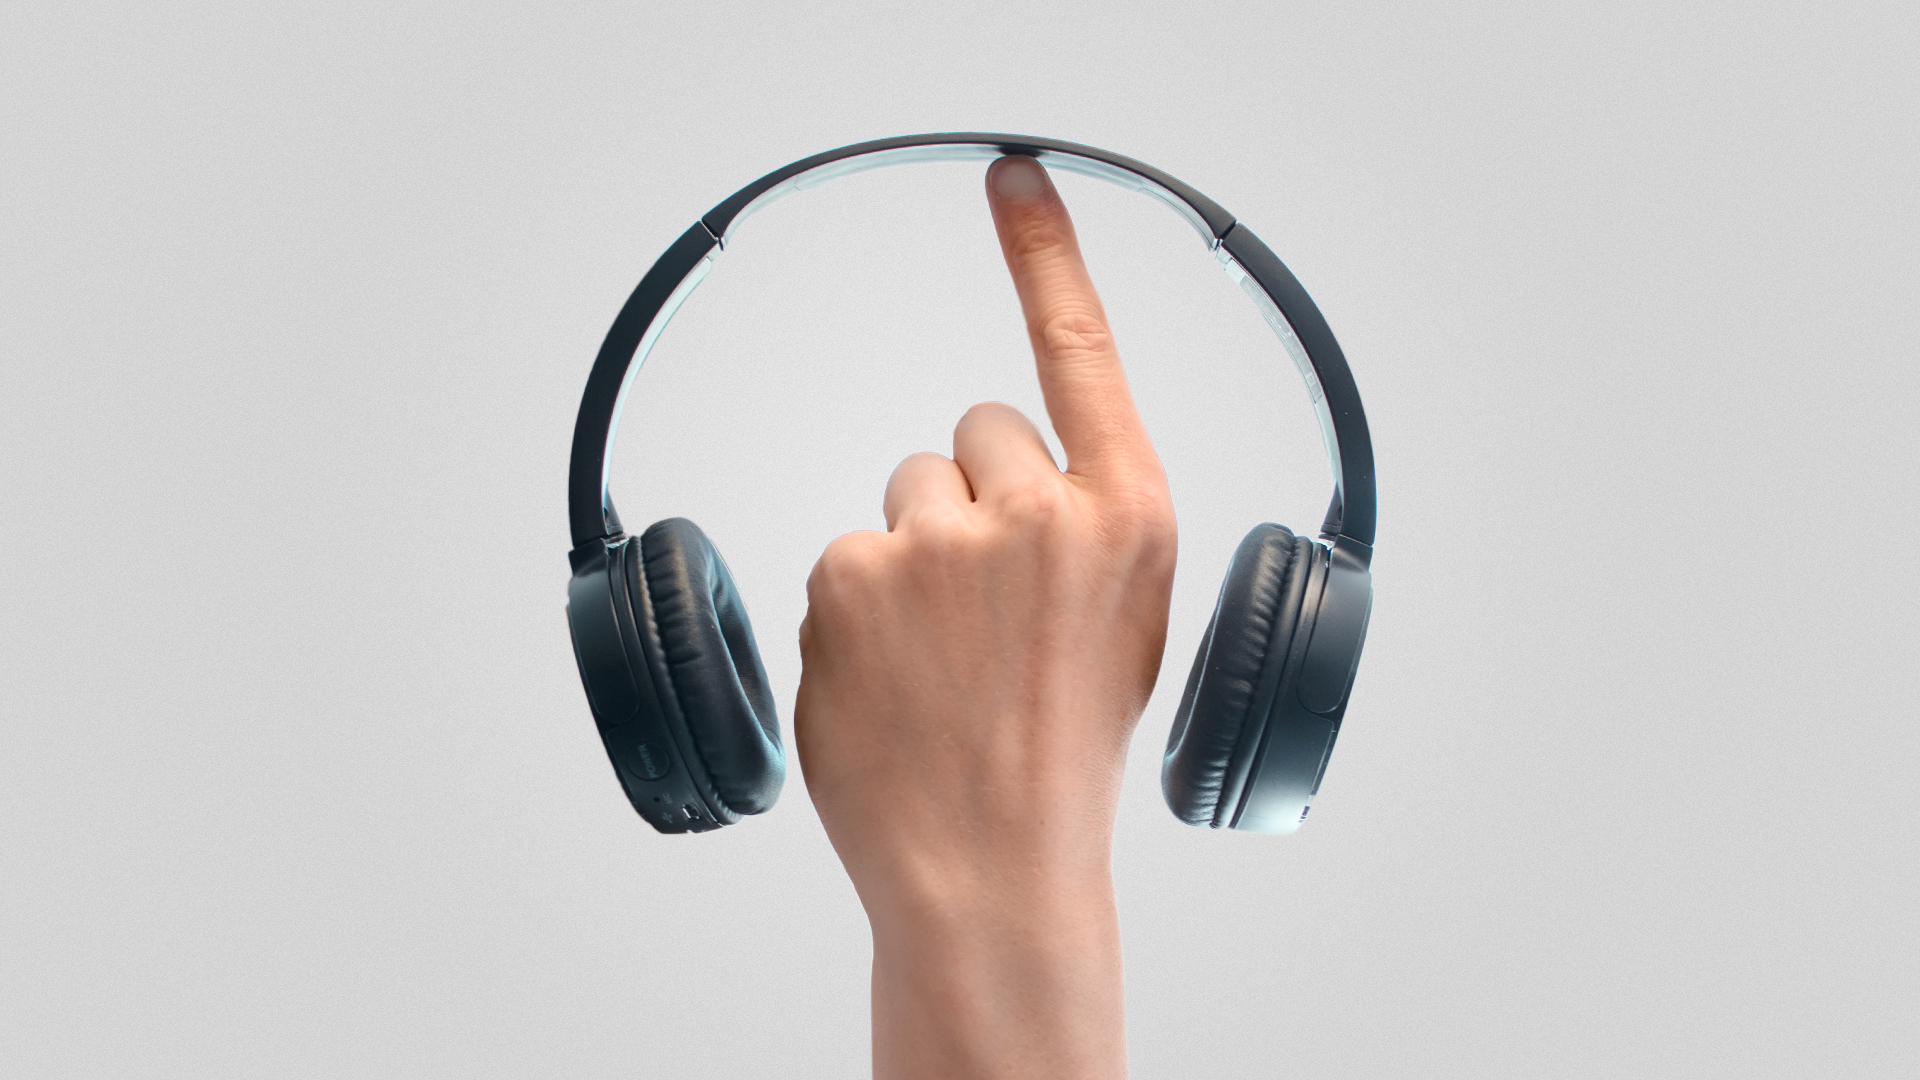 Sound in VR training